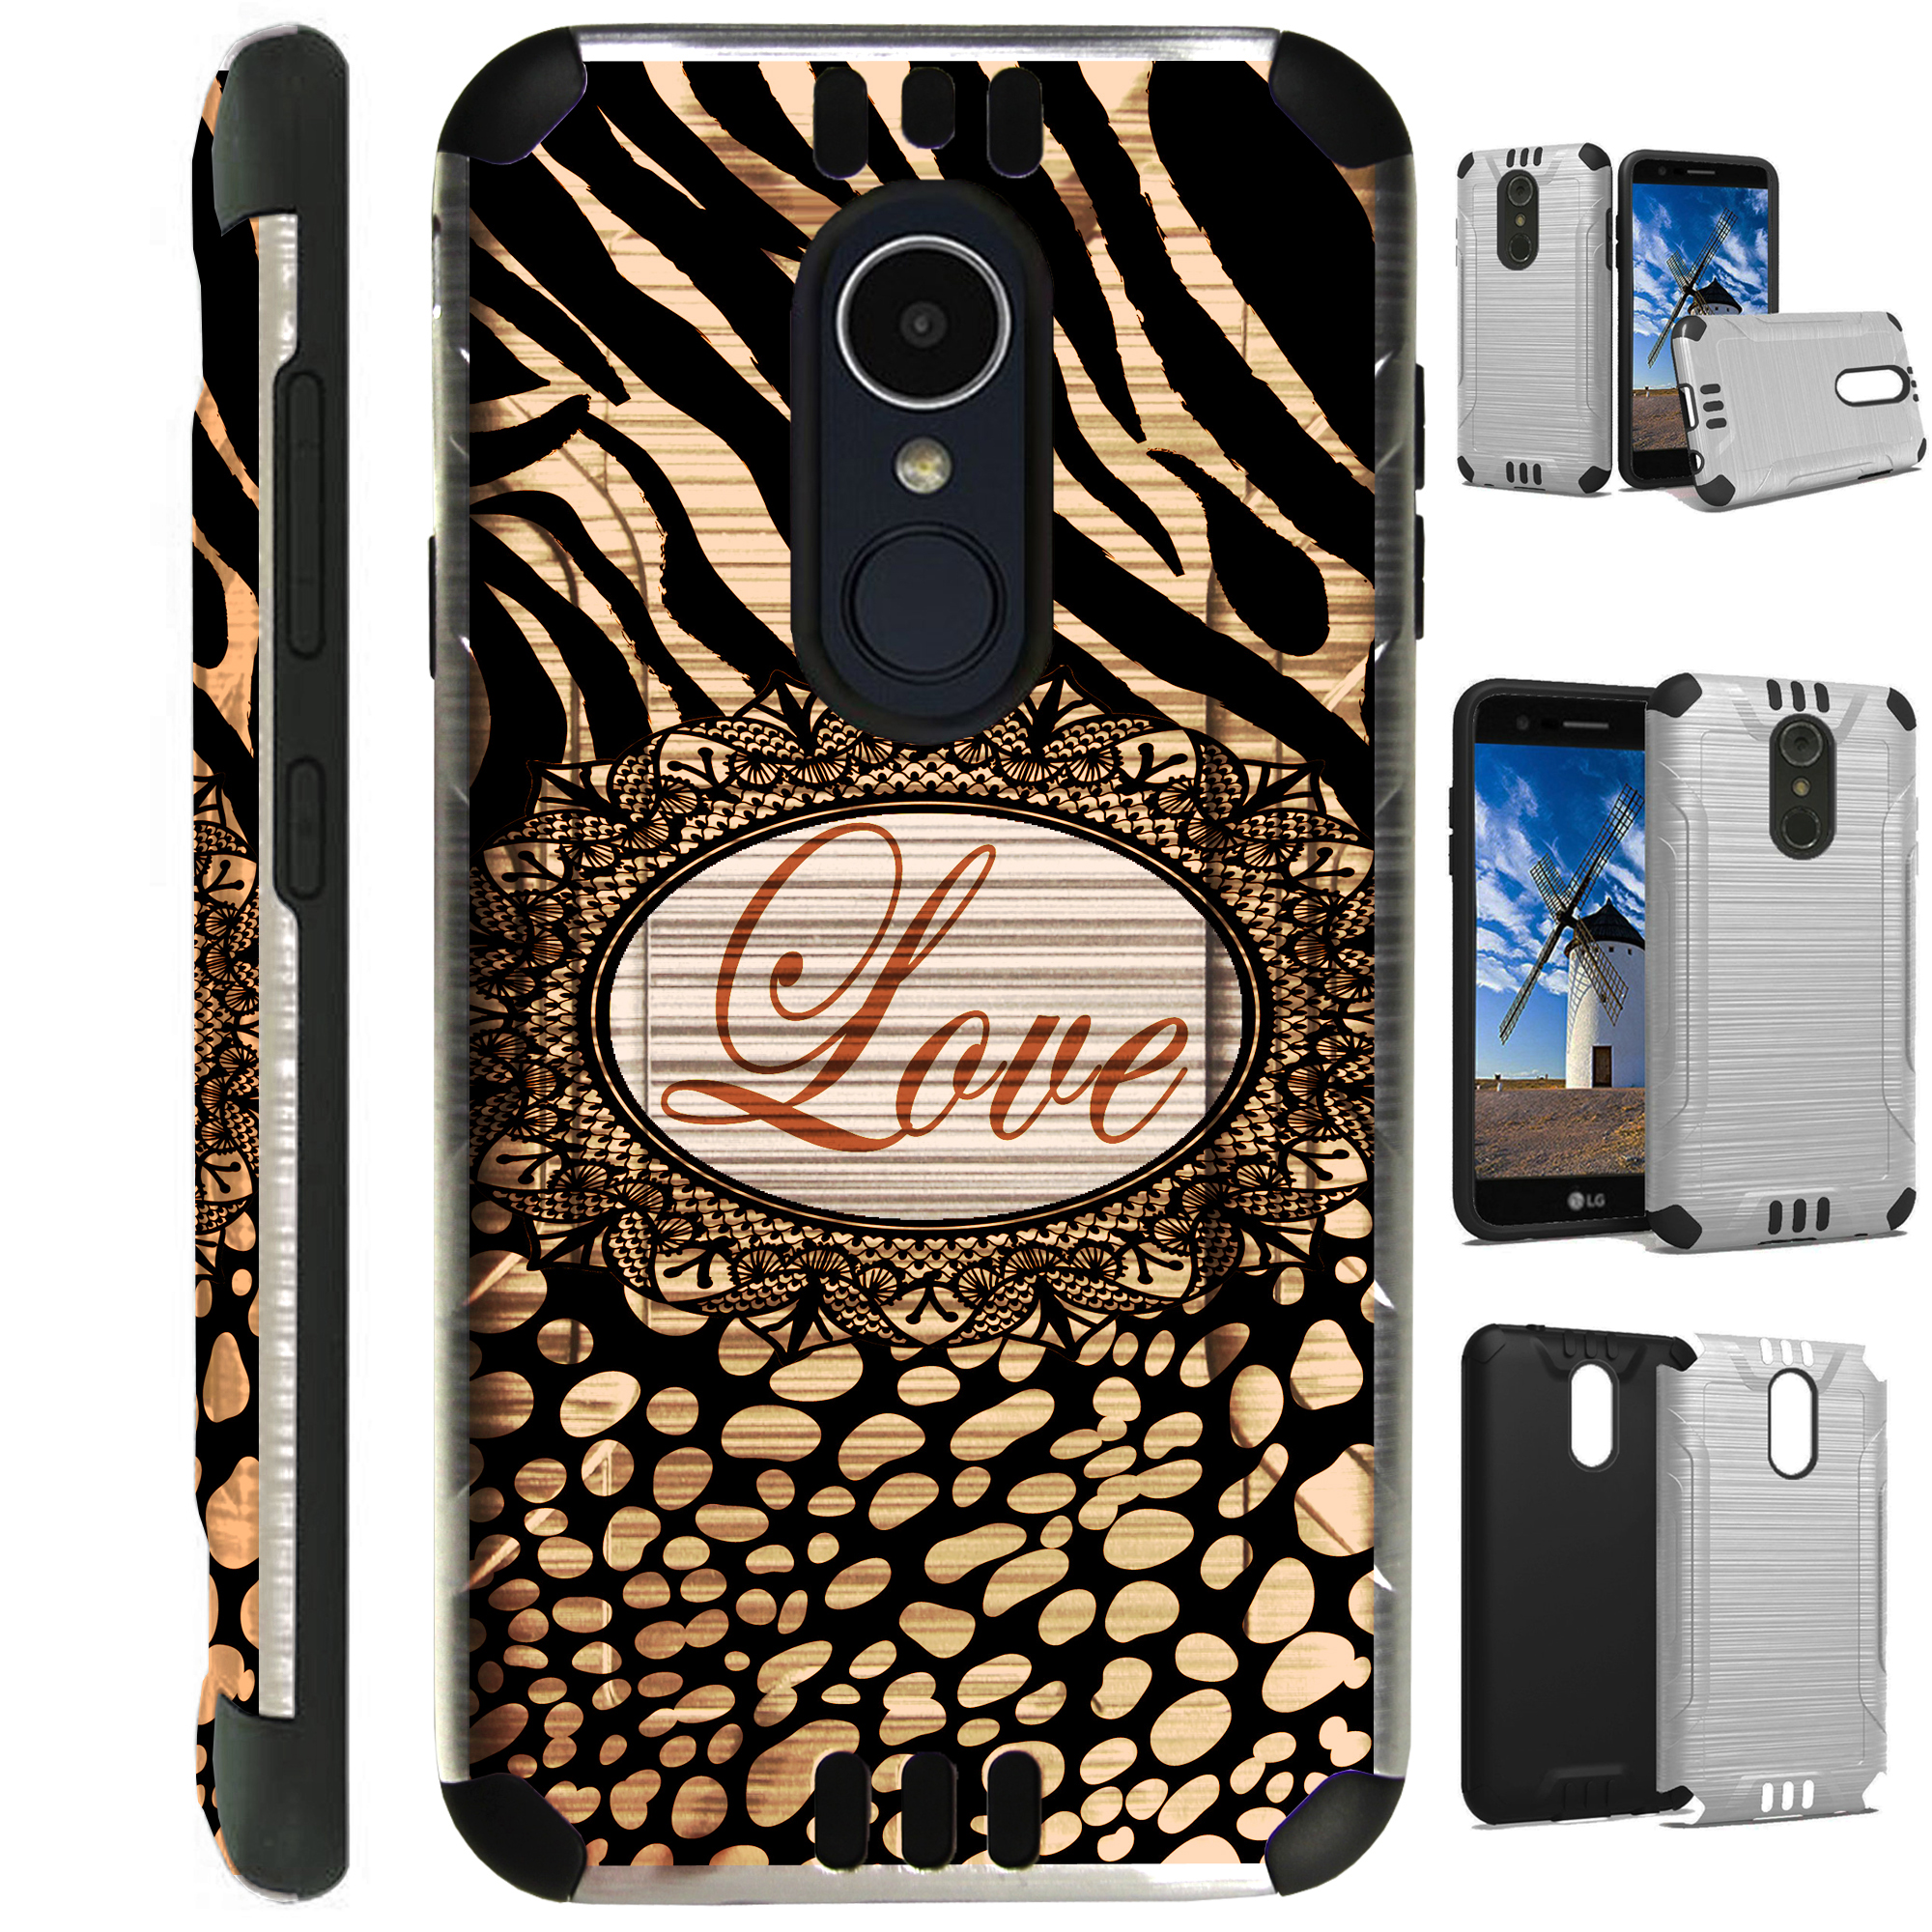 For LG Rebel 3 | LG Rebel 4 Case Brushed Metal Texture Hybrid TPU Silver Guard Phone Cover (Brown Zebra Love)